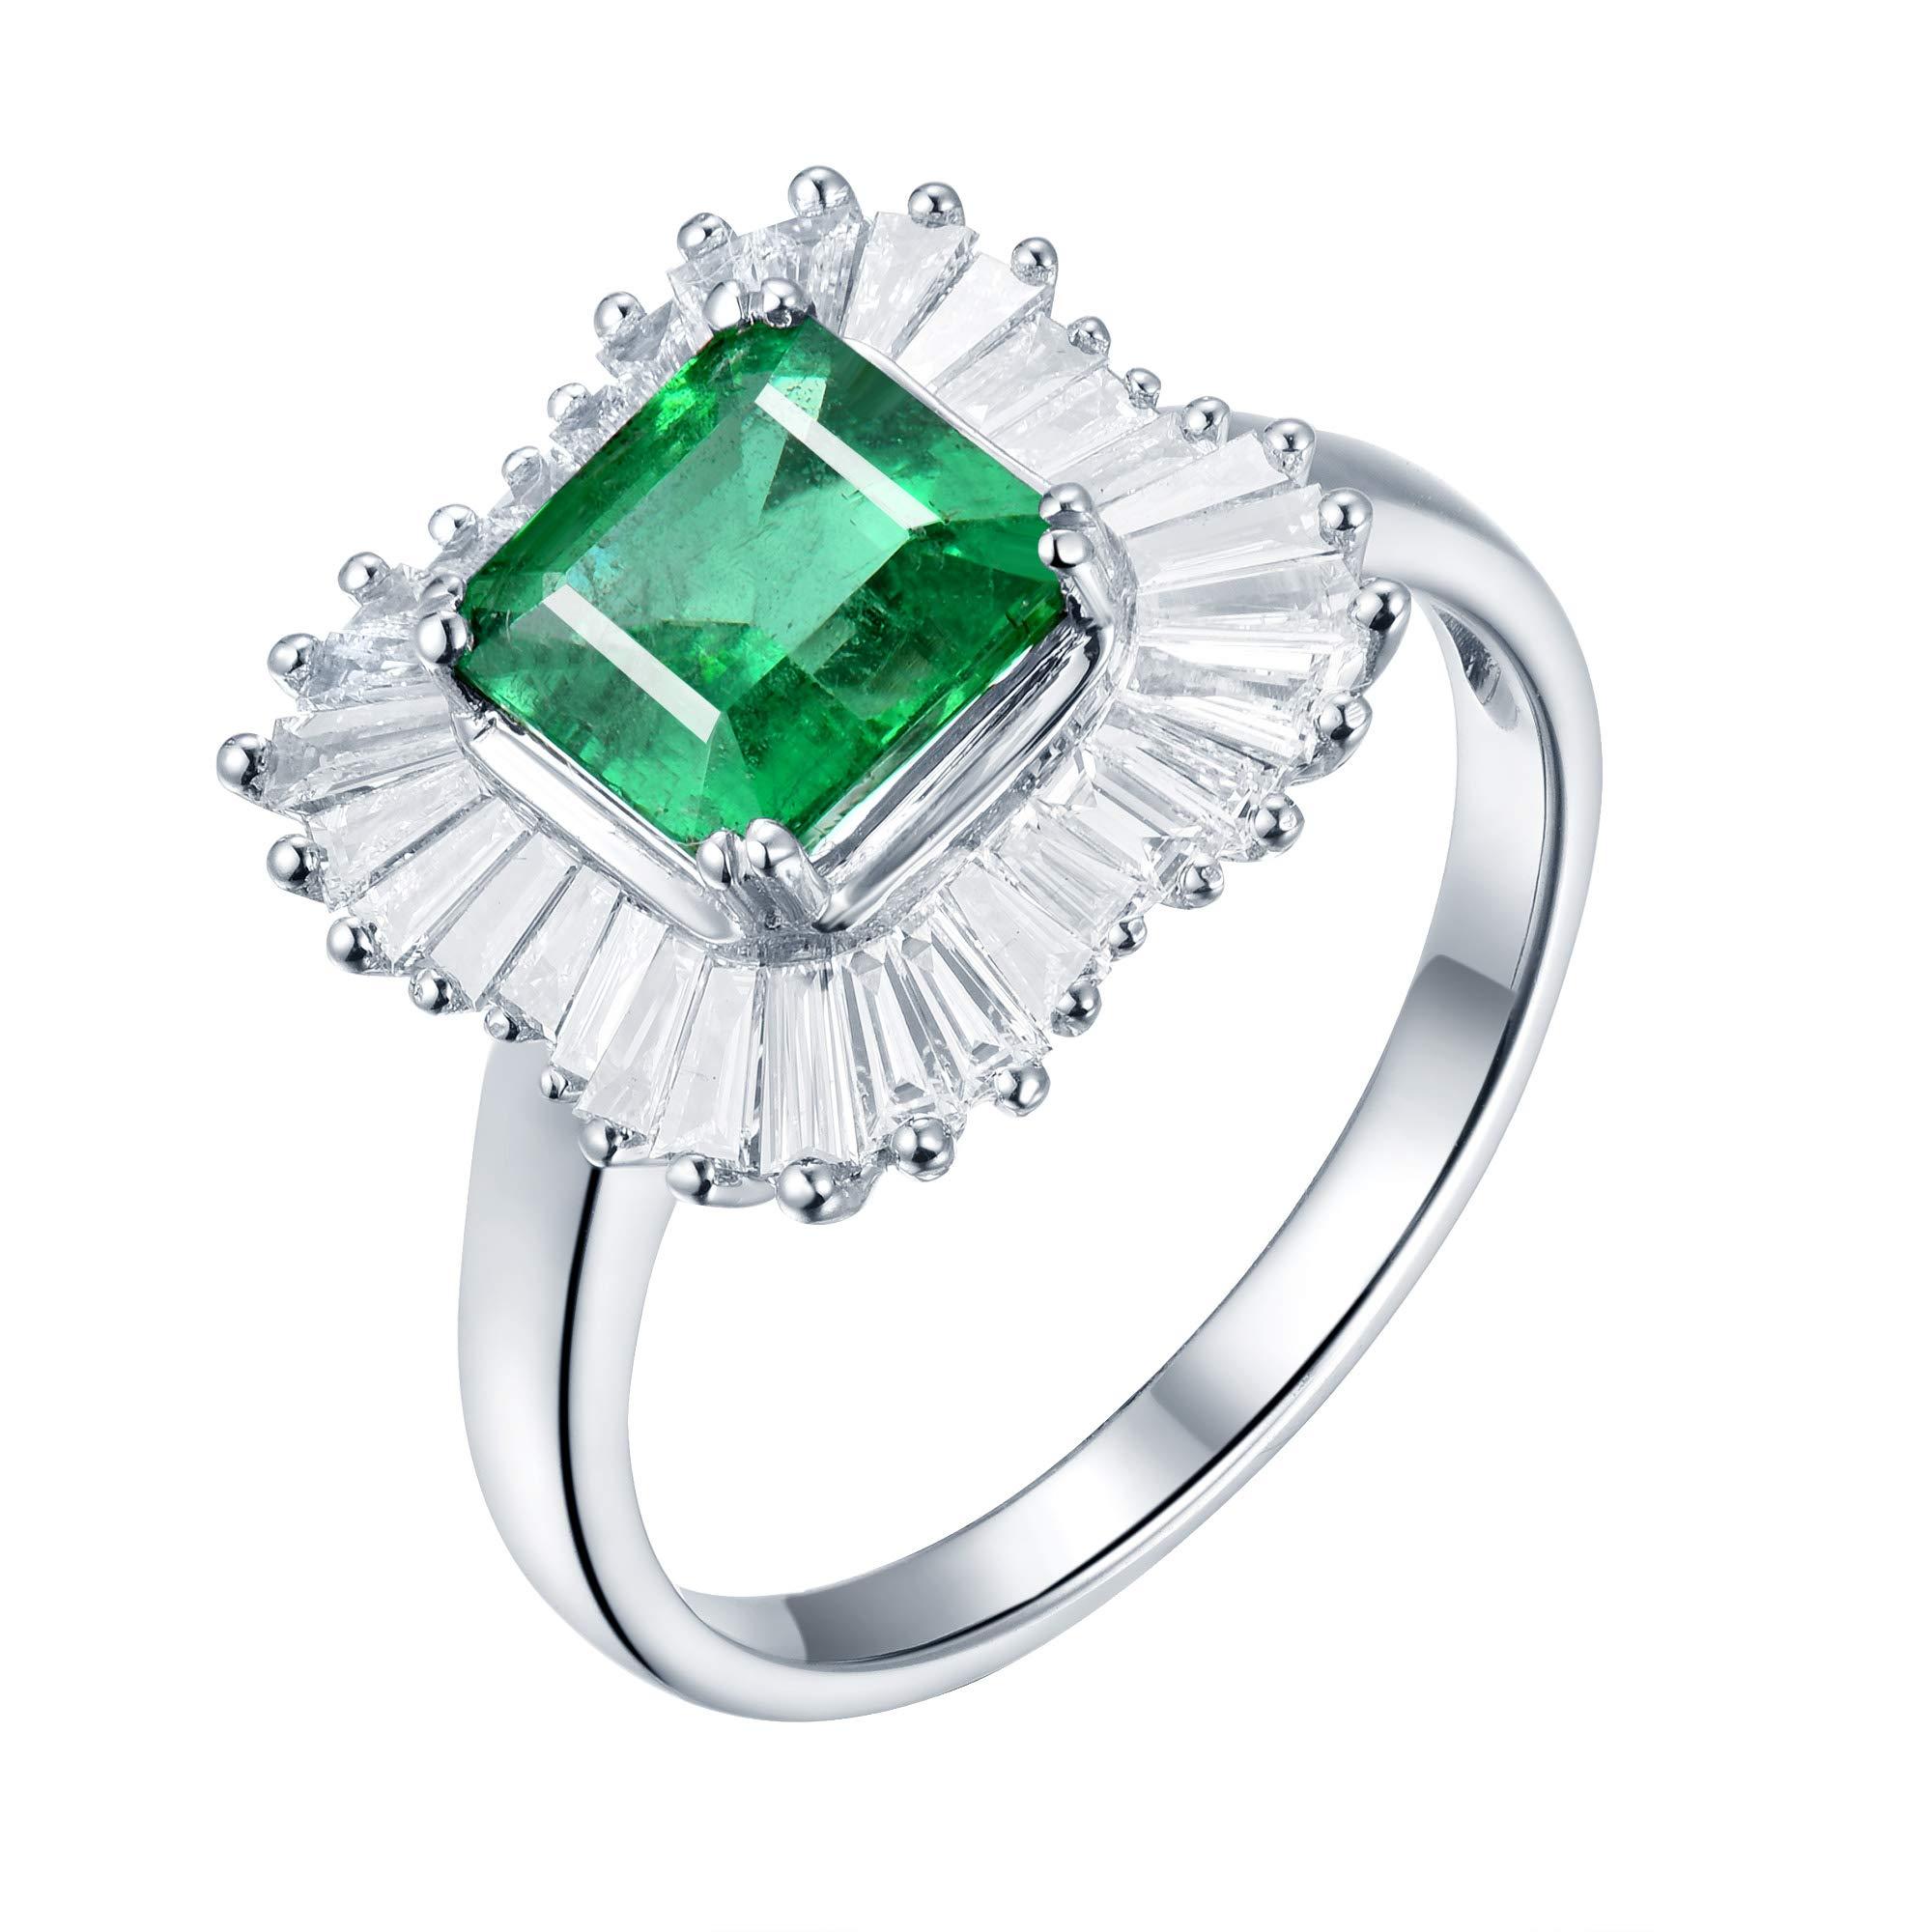 Lanmi Beautiful Natural Green Real Emerald Diamonds Engagement Ring Solid 14K White Gold Wedding Rings for Ladies Women